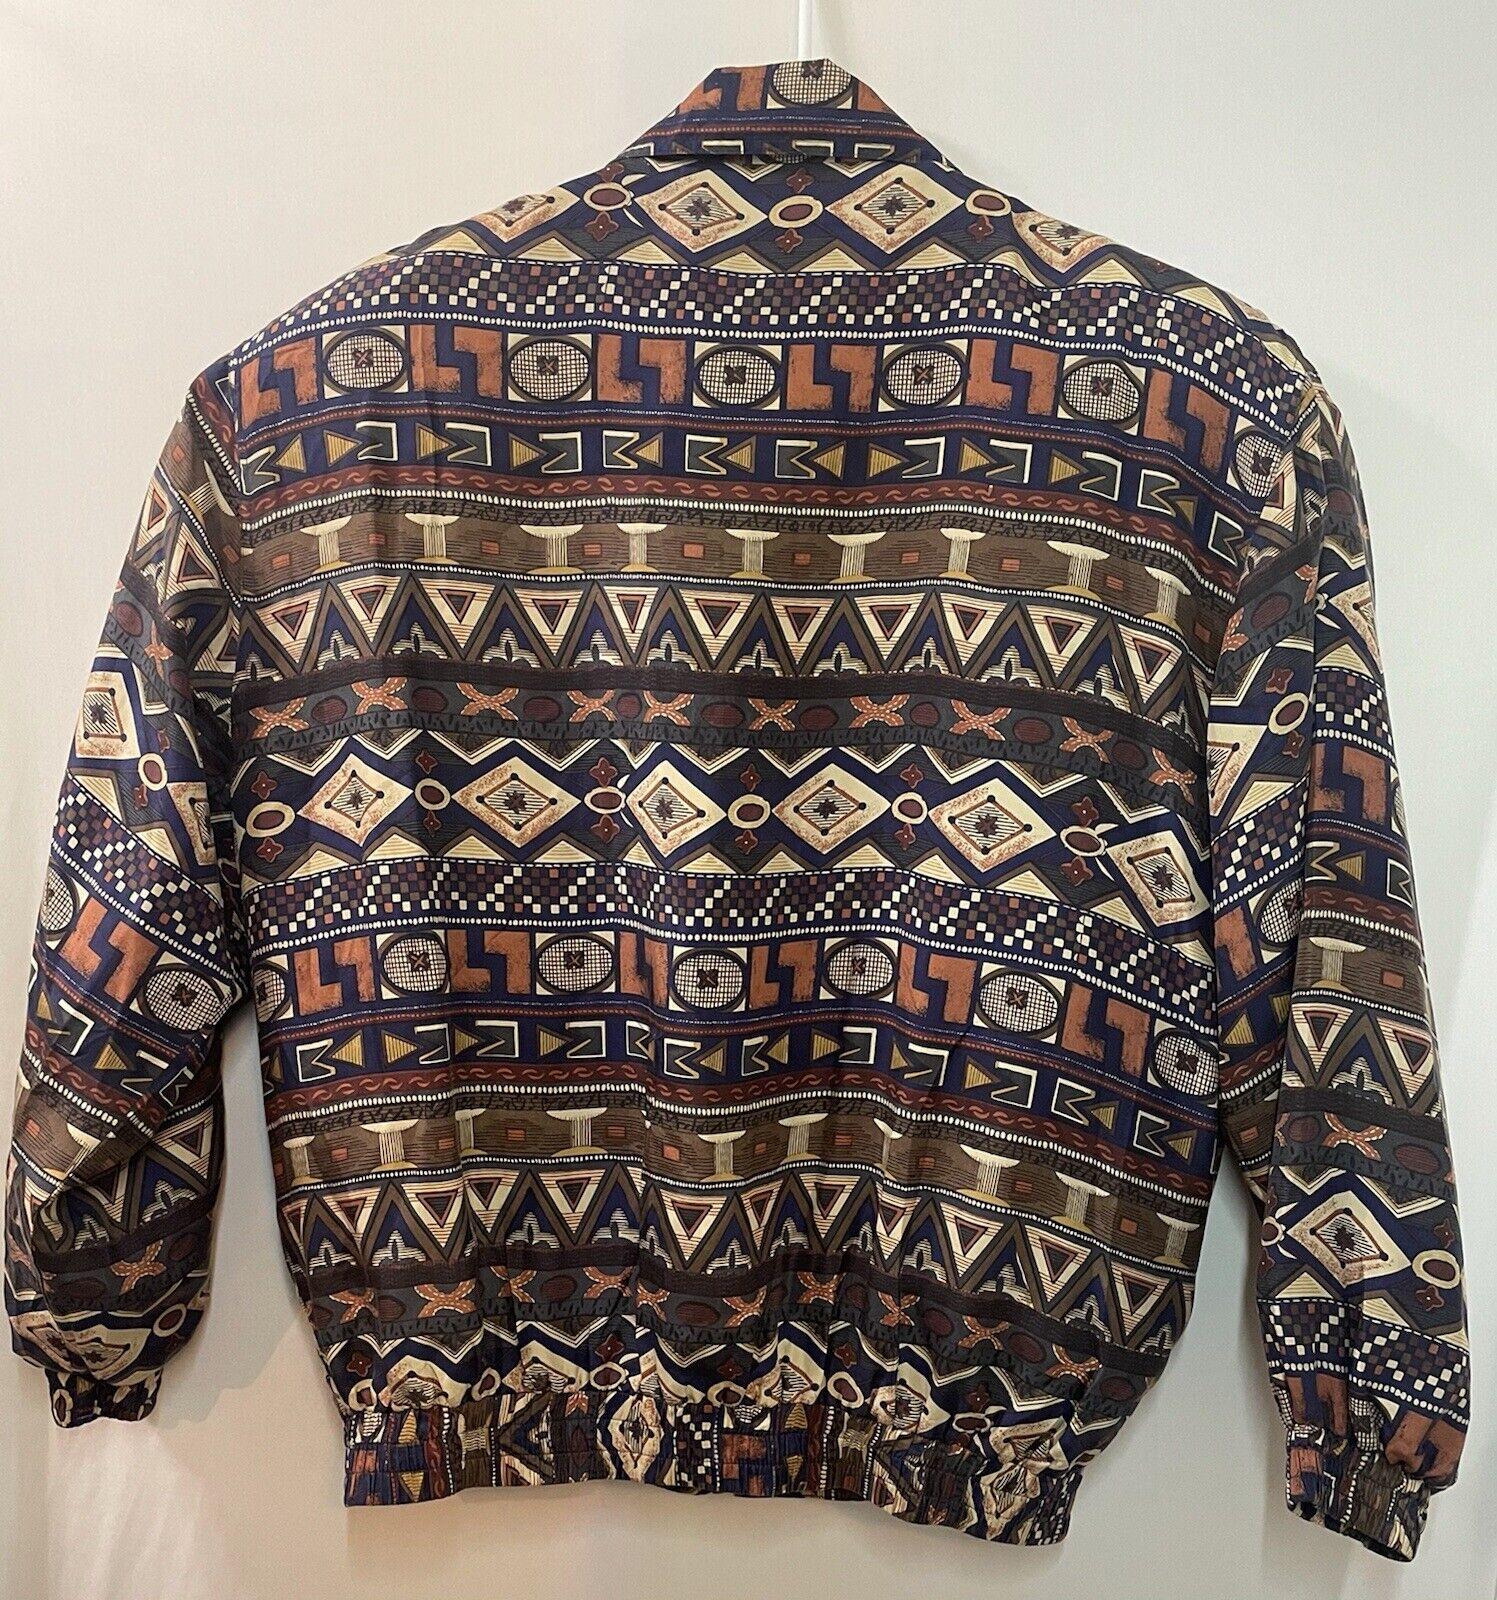 Vintage Fuda International Puffer Jacket XL - image 2